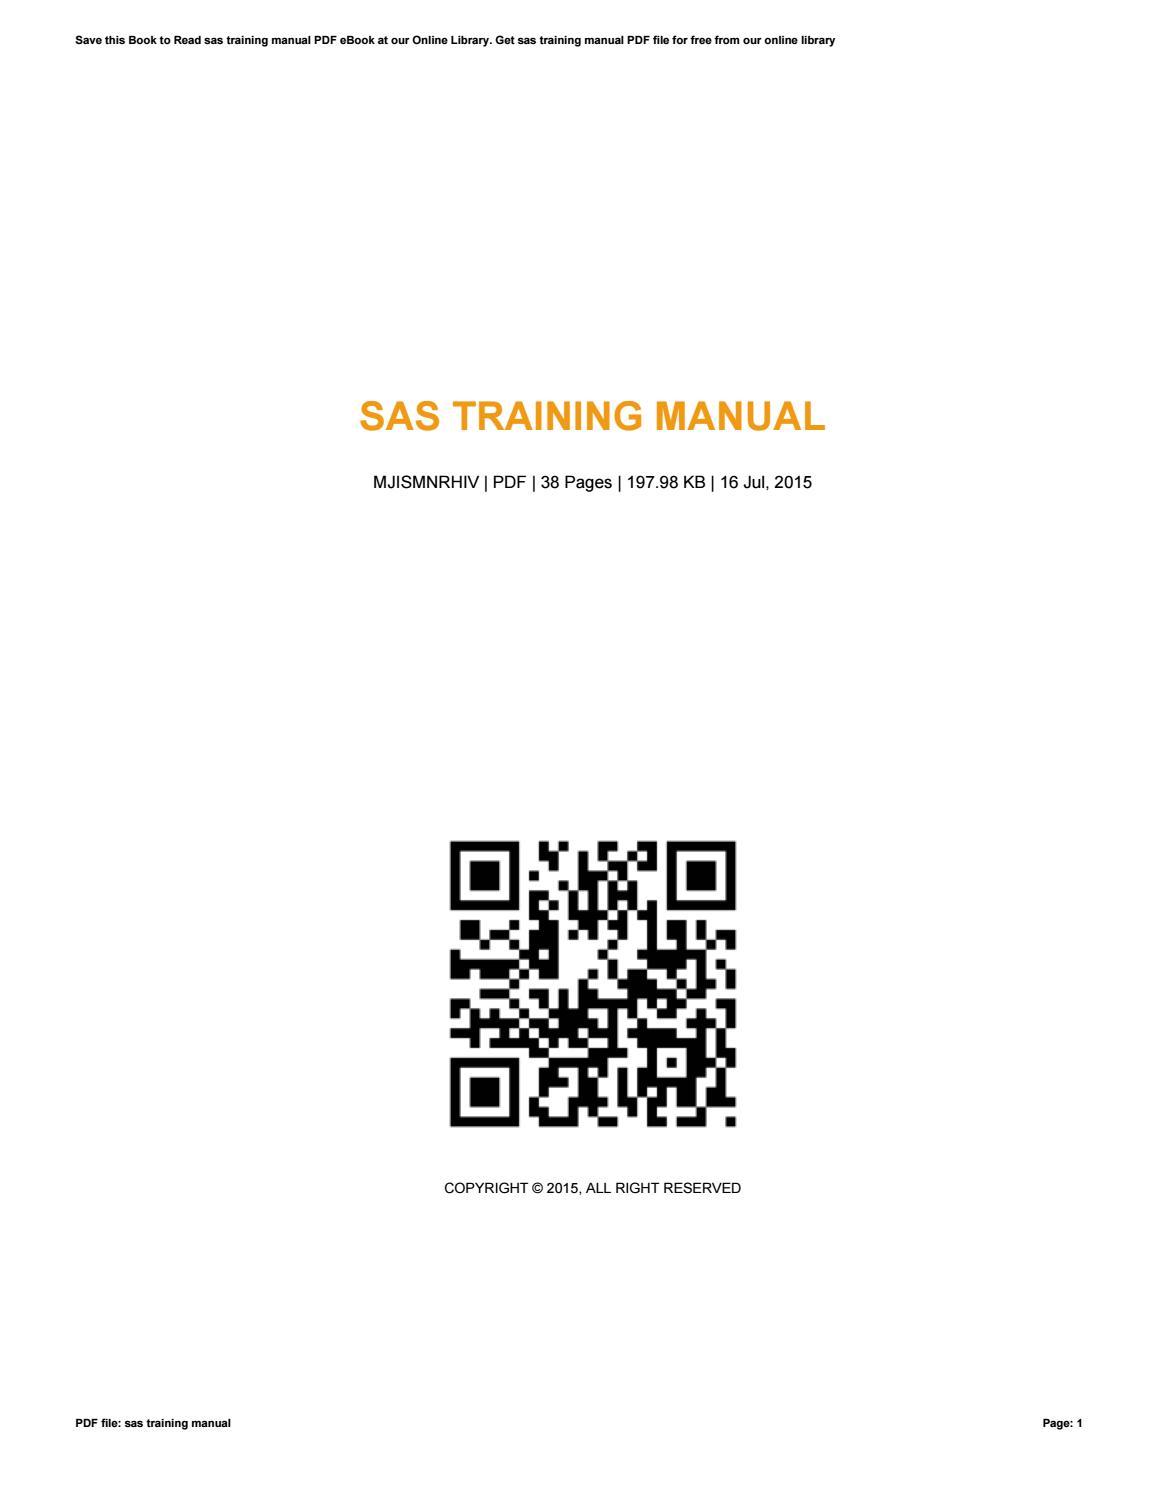 Sas training manual by manuelortiz3961 issuu.